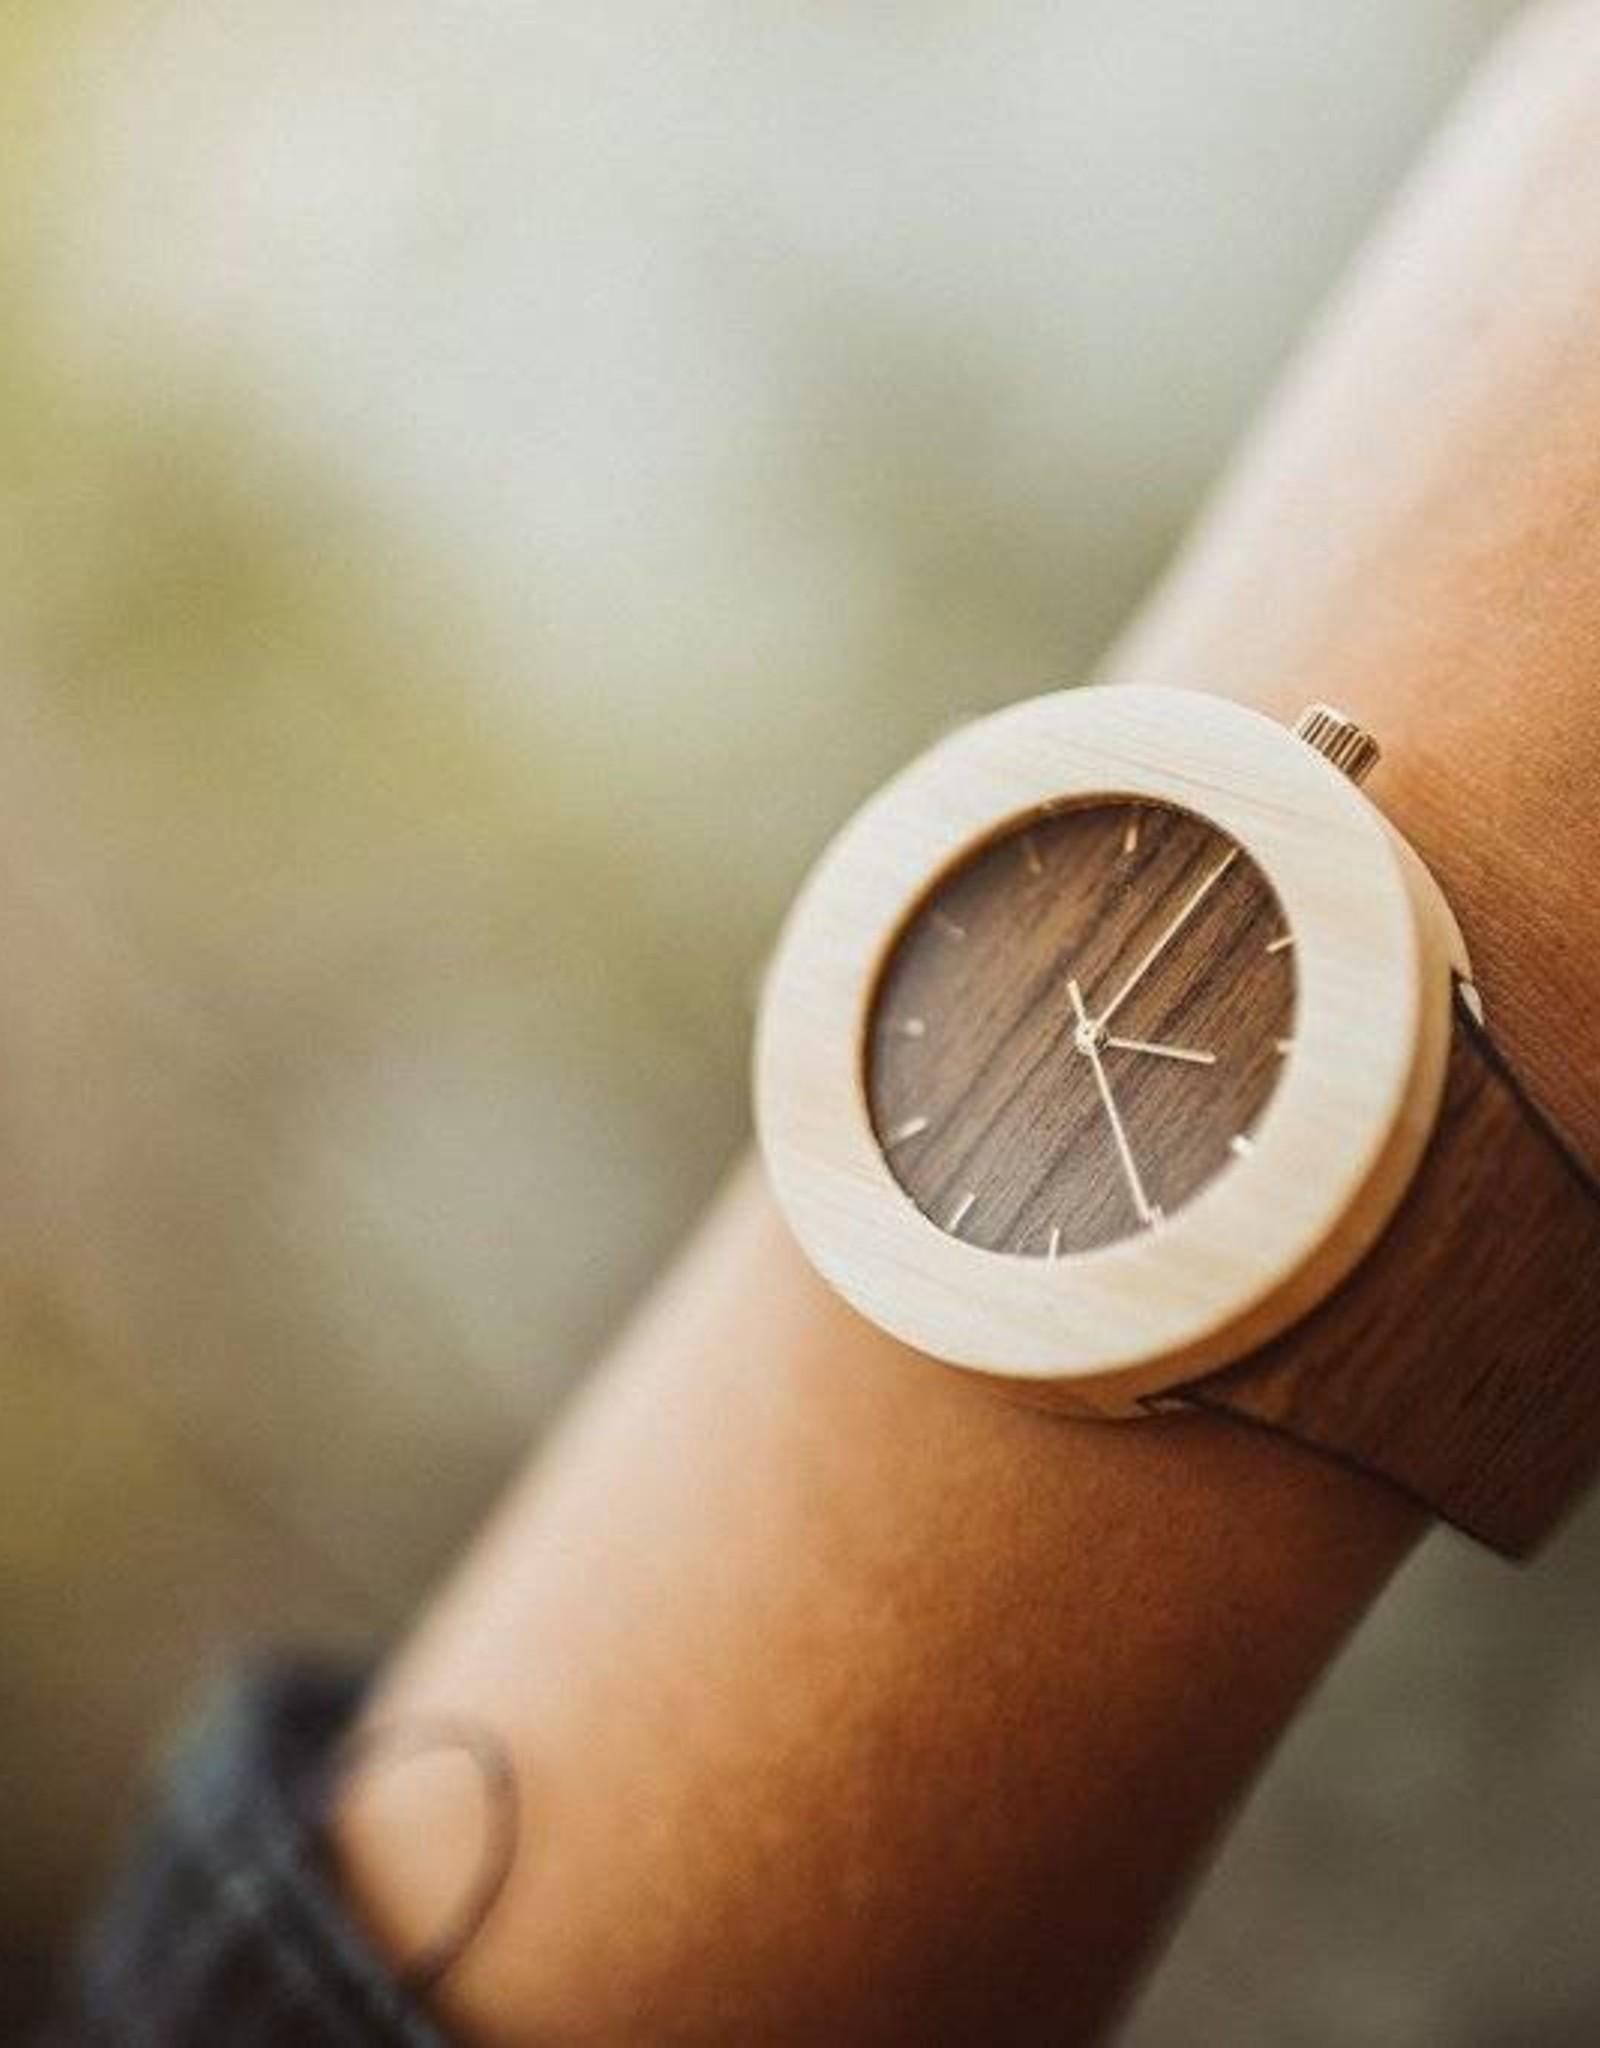 Analog Watch Co. Teak and Bamboo - No Hour Markings